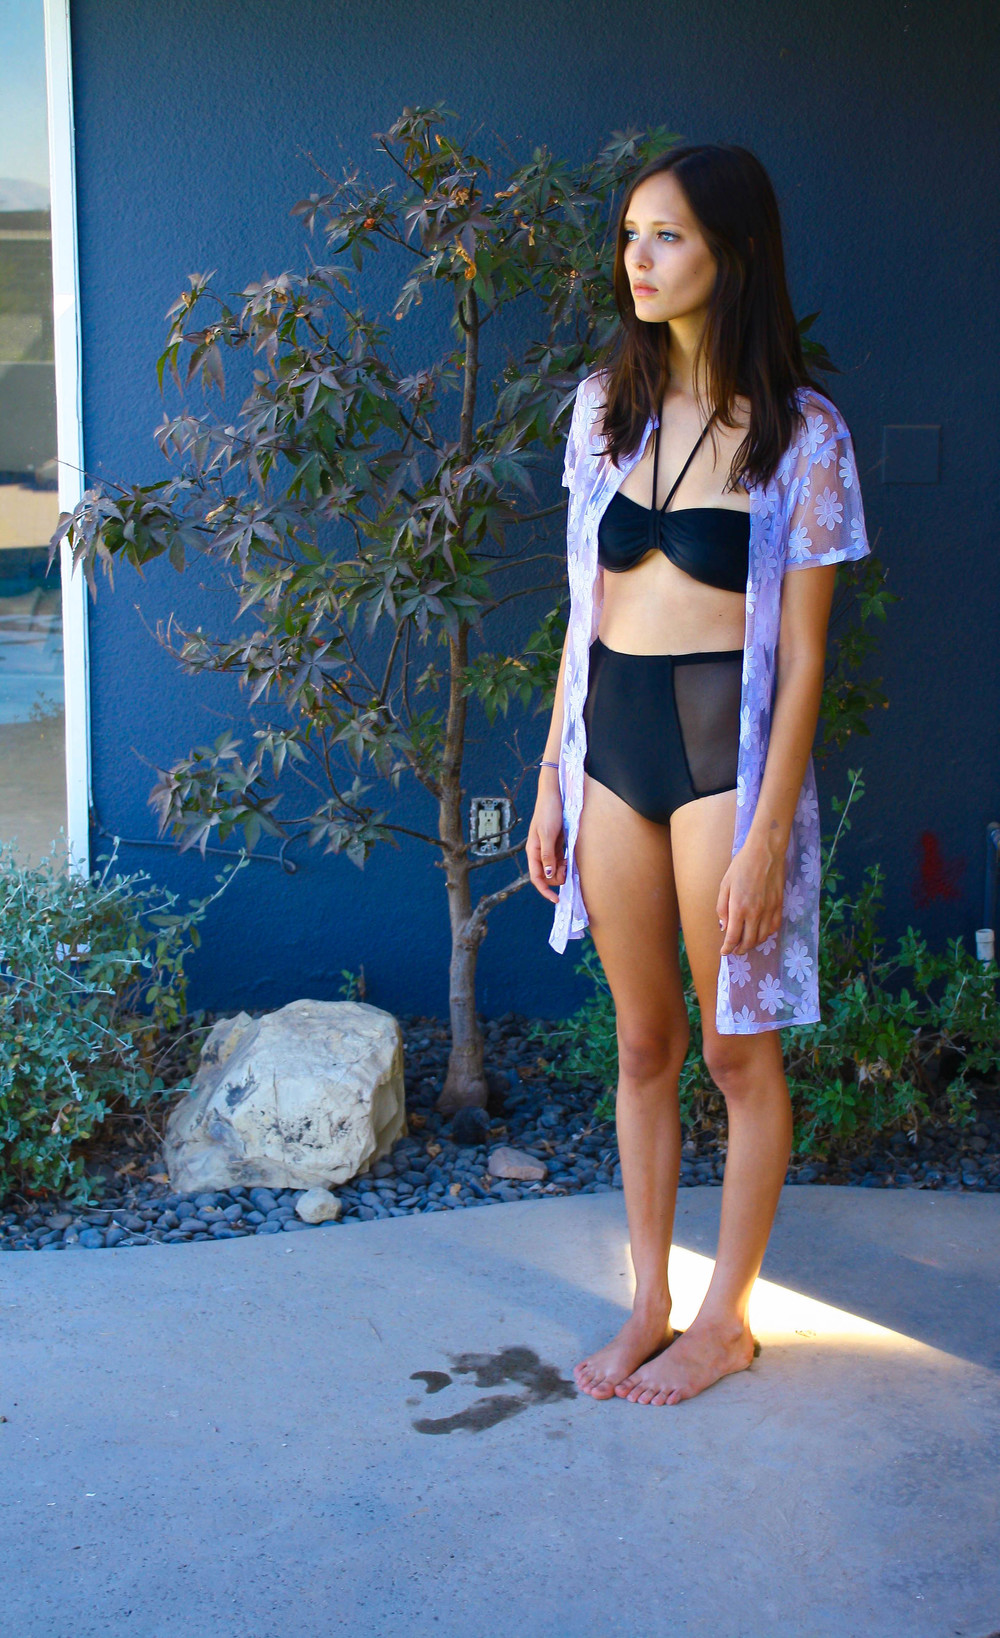 2019 Sammie Yochelson nude (97 photos), Hot